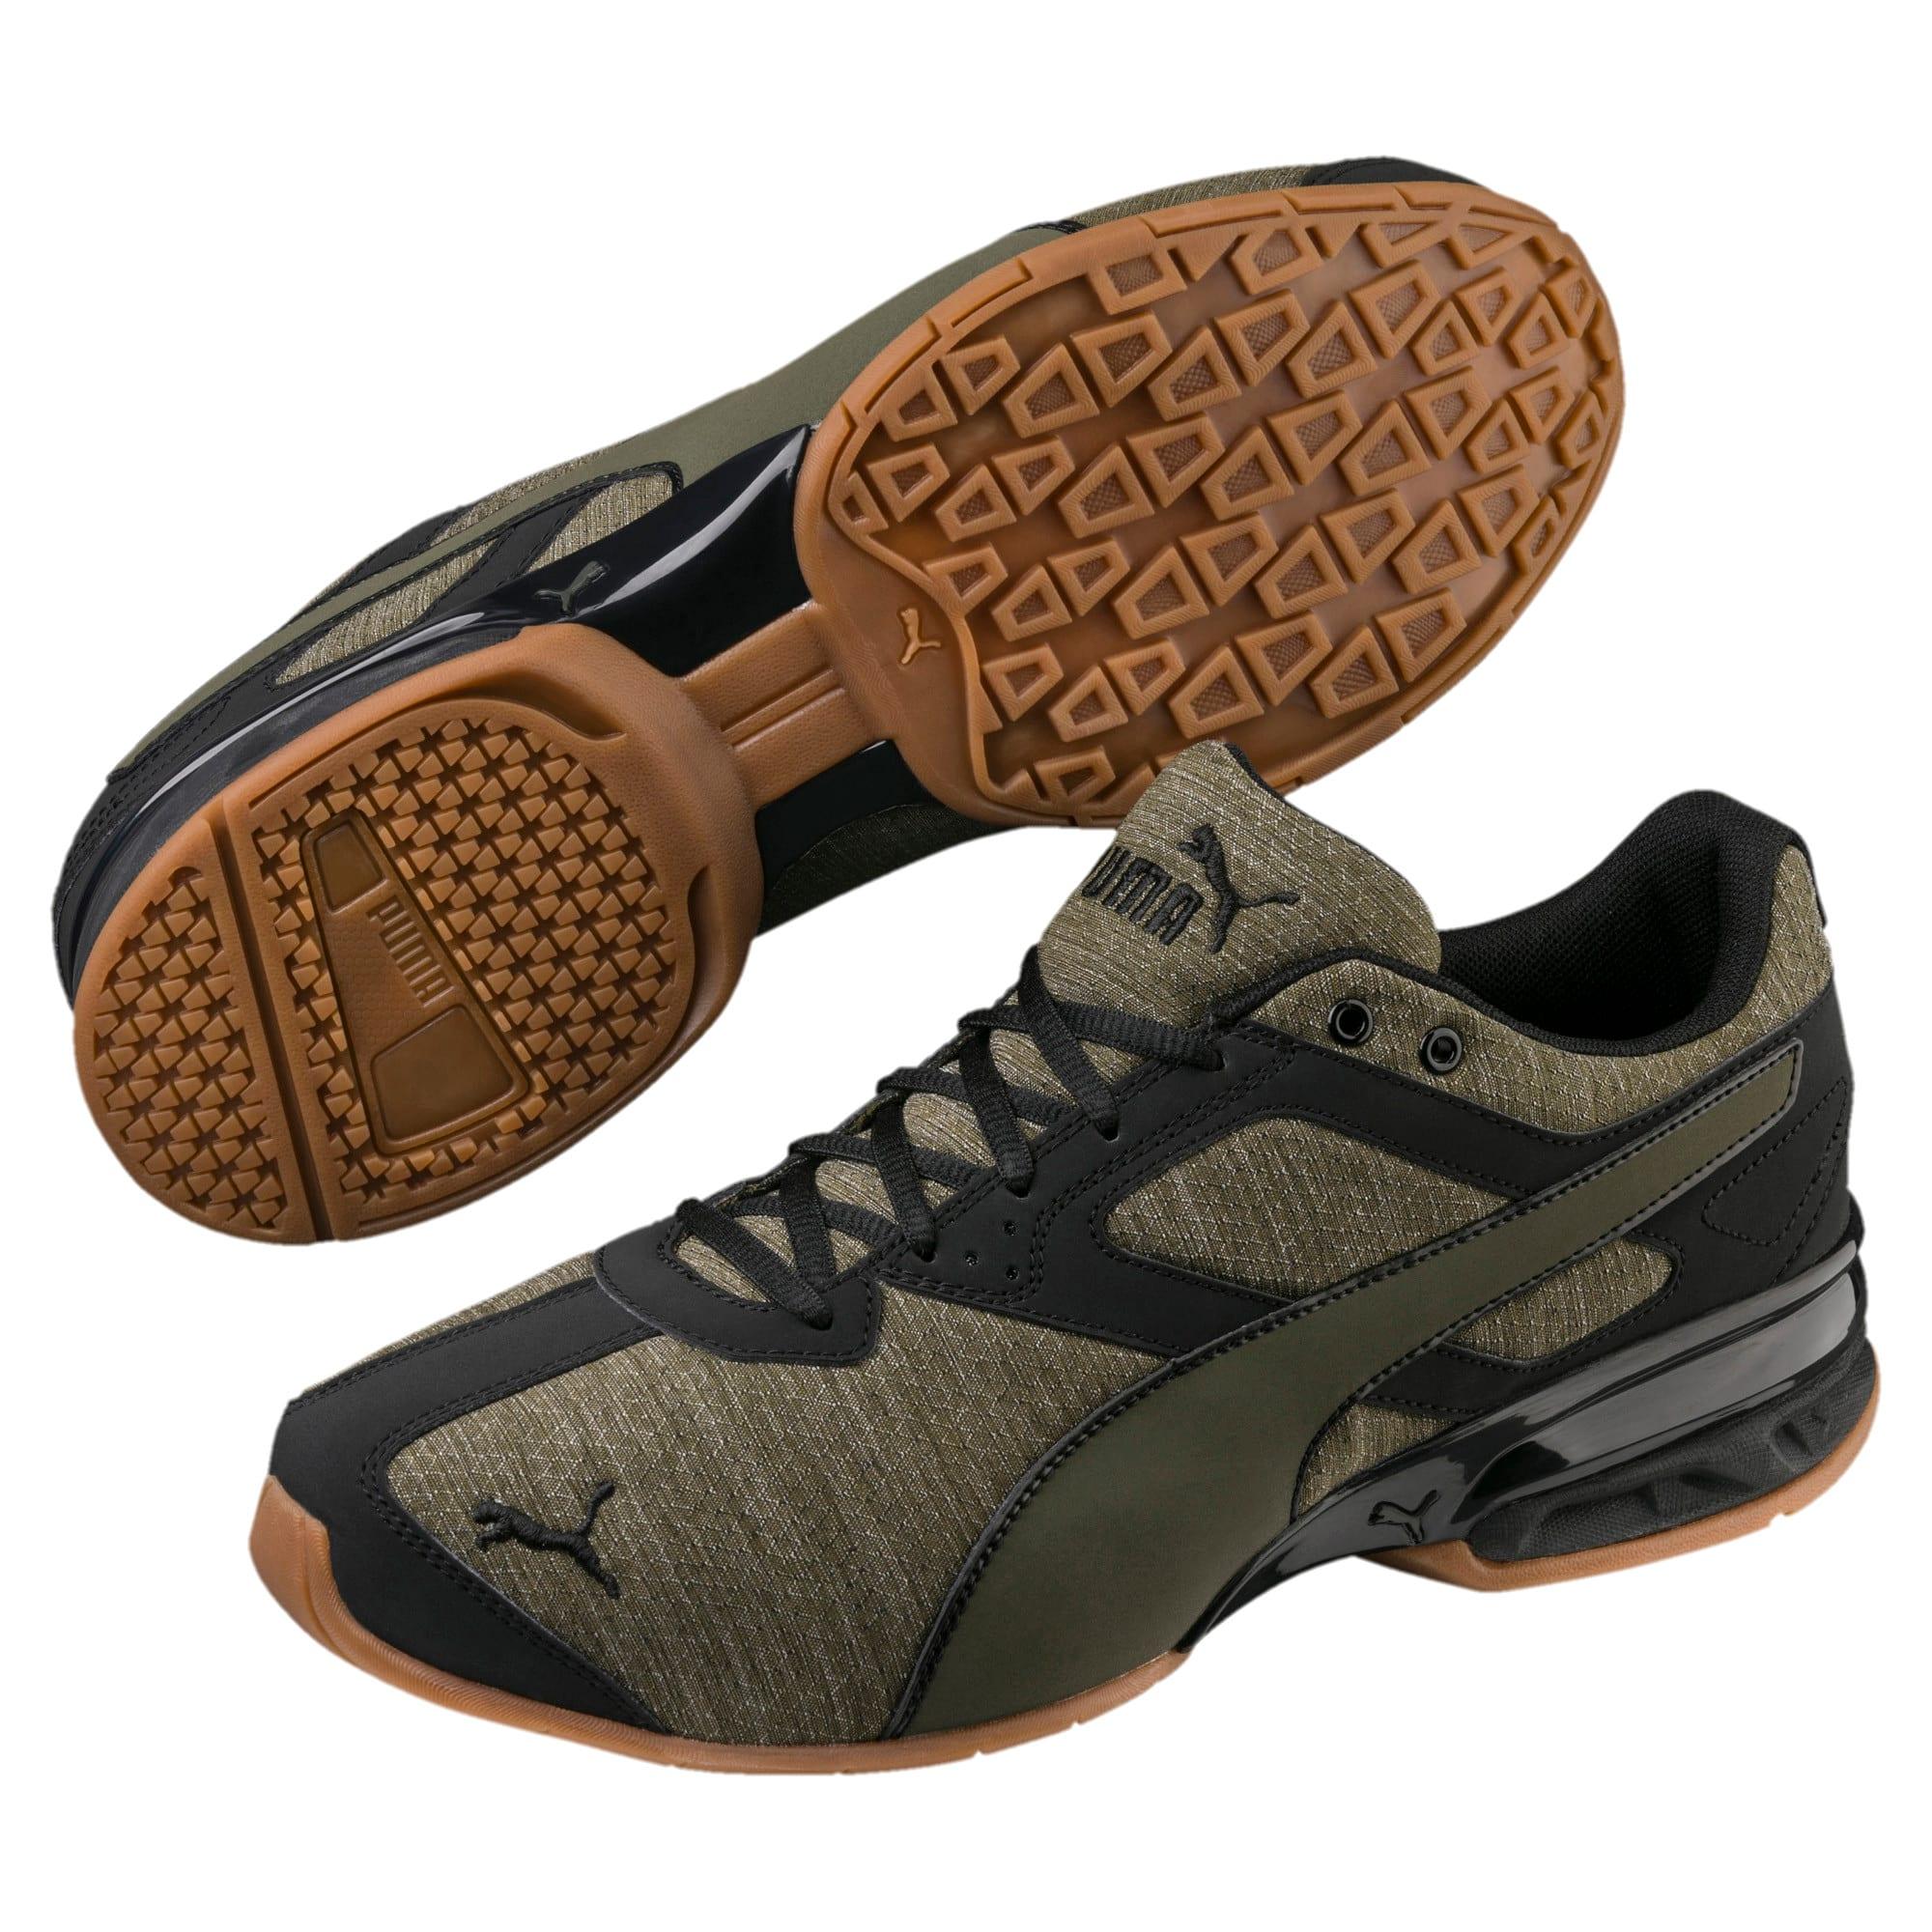 Thumbnail 2 of Tazon 6 Heather Rip Men's Sneakers, Forest Night-Puma Black, medium